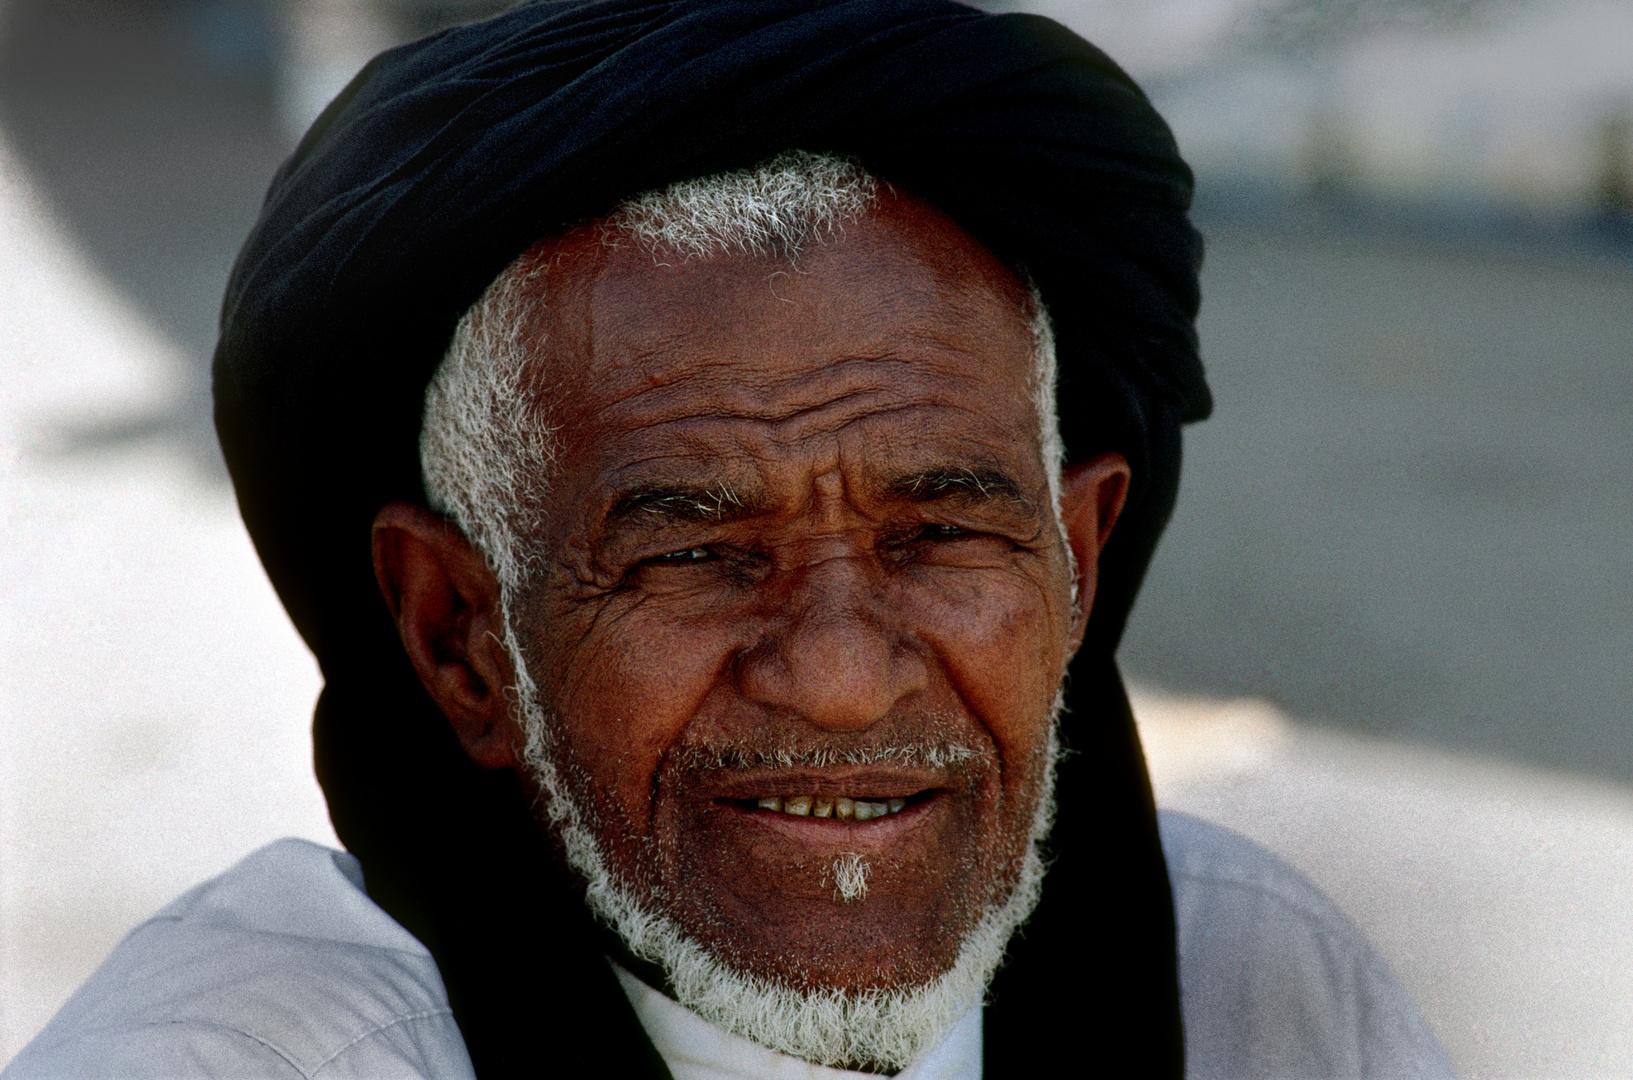 Händler auf dem Djamaa el Fna